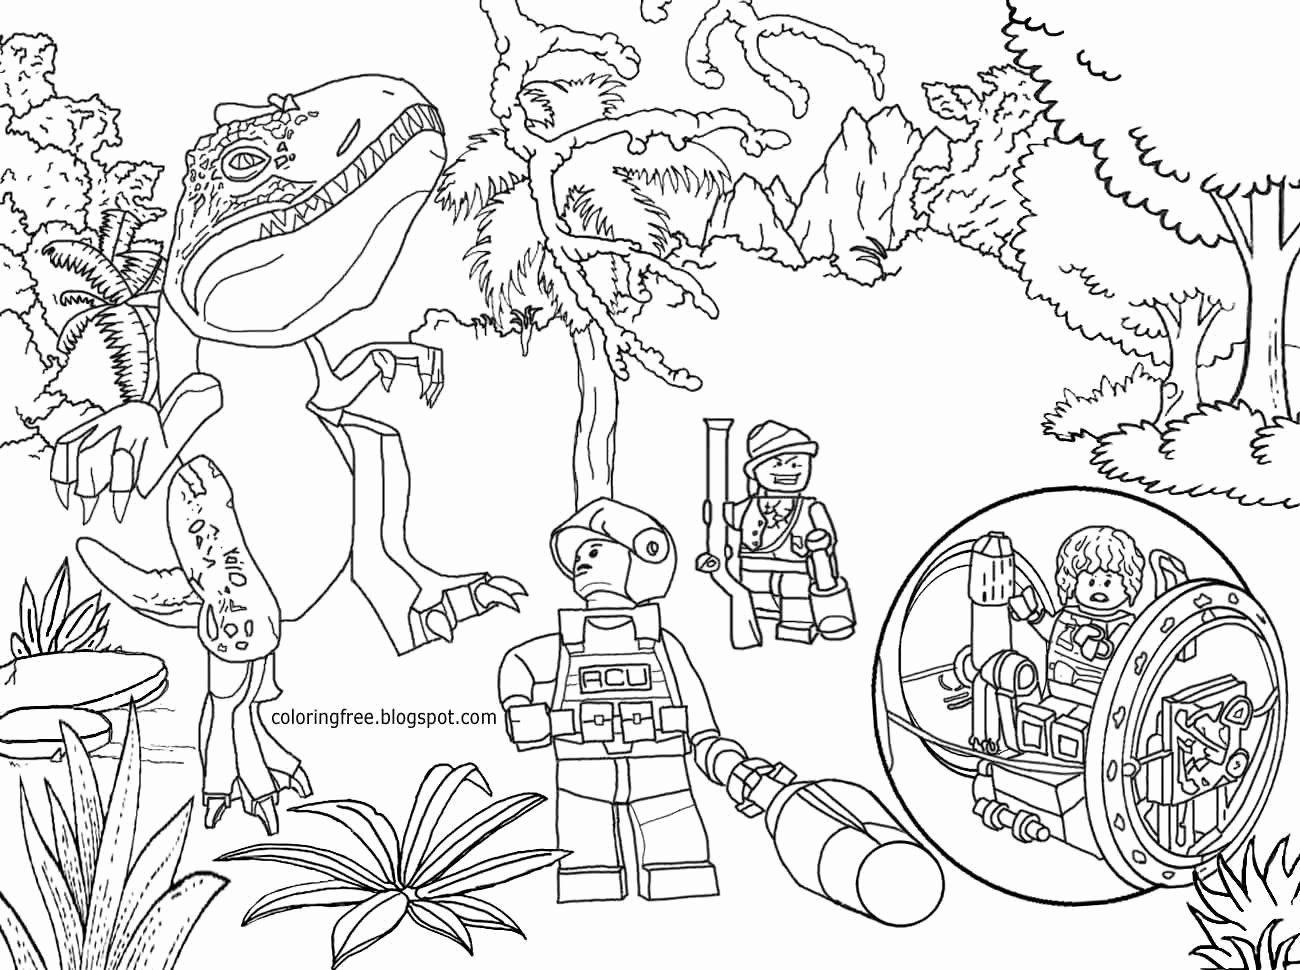 Jurassic Park Coloring Page Fresh Jurassic Park Free Coloring Pages Dinosaur Coloring Pages Lego Coloring Pages Coloring Pages